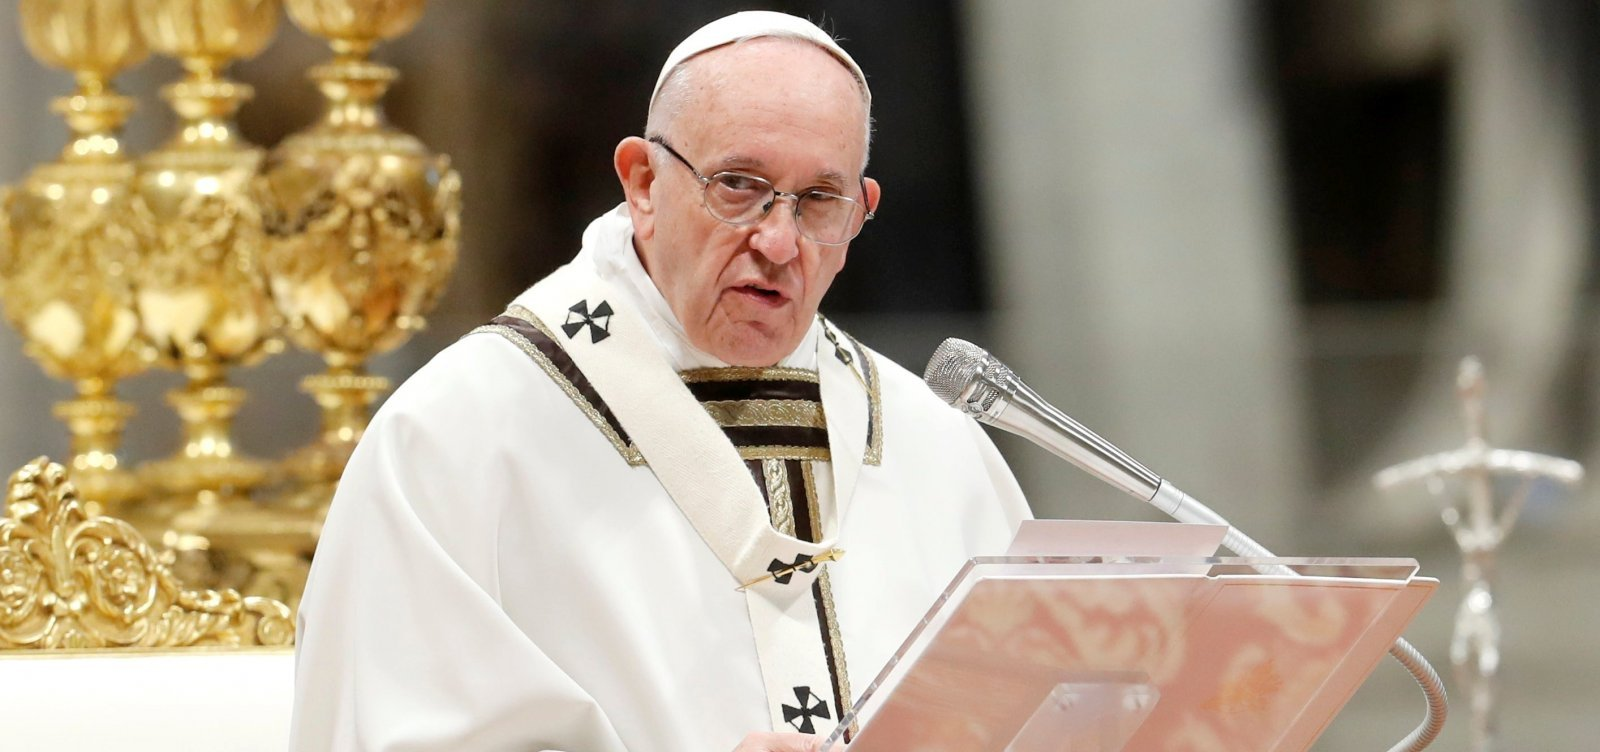 [Papa compara a Hitler políticos que discursam contra gays, judeus e ciganos]